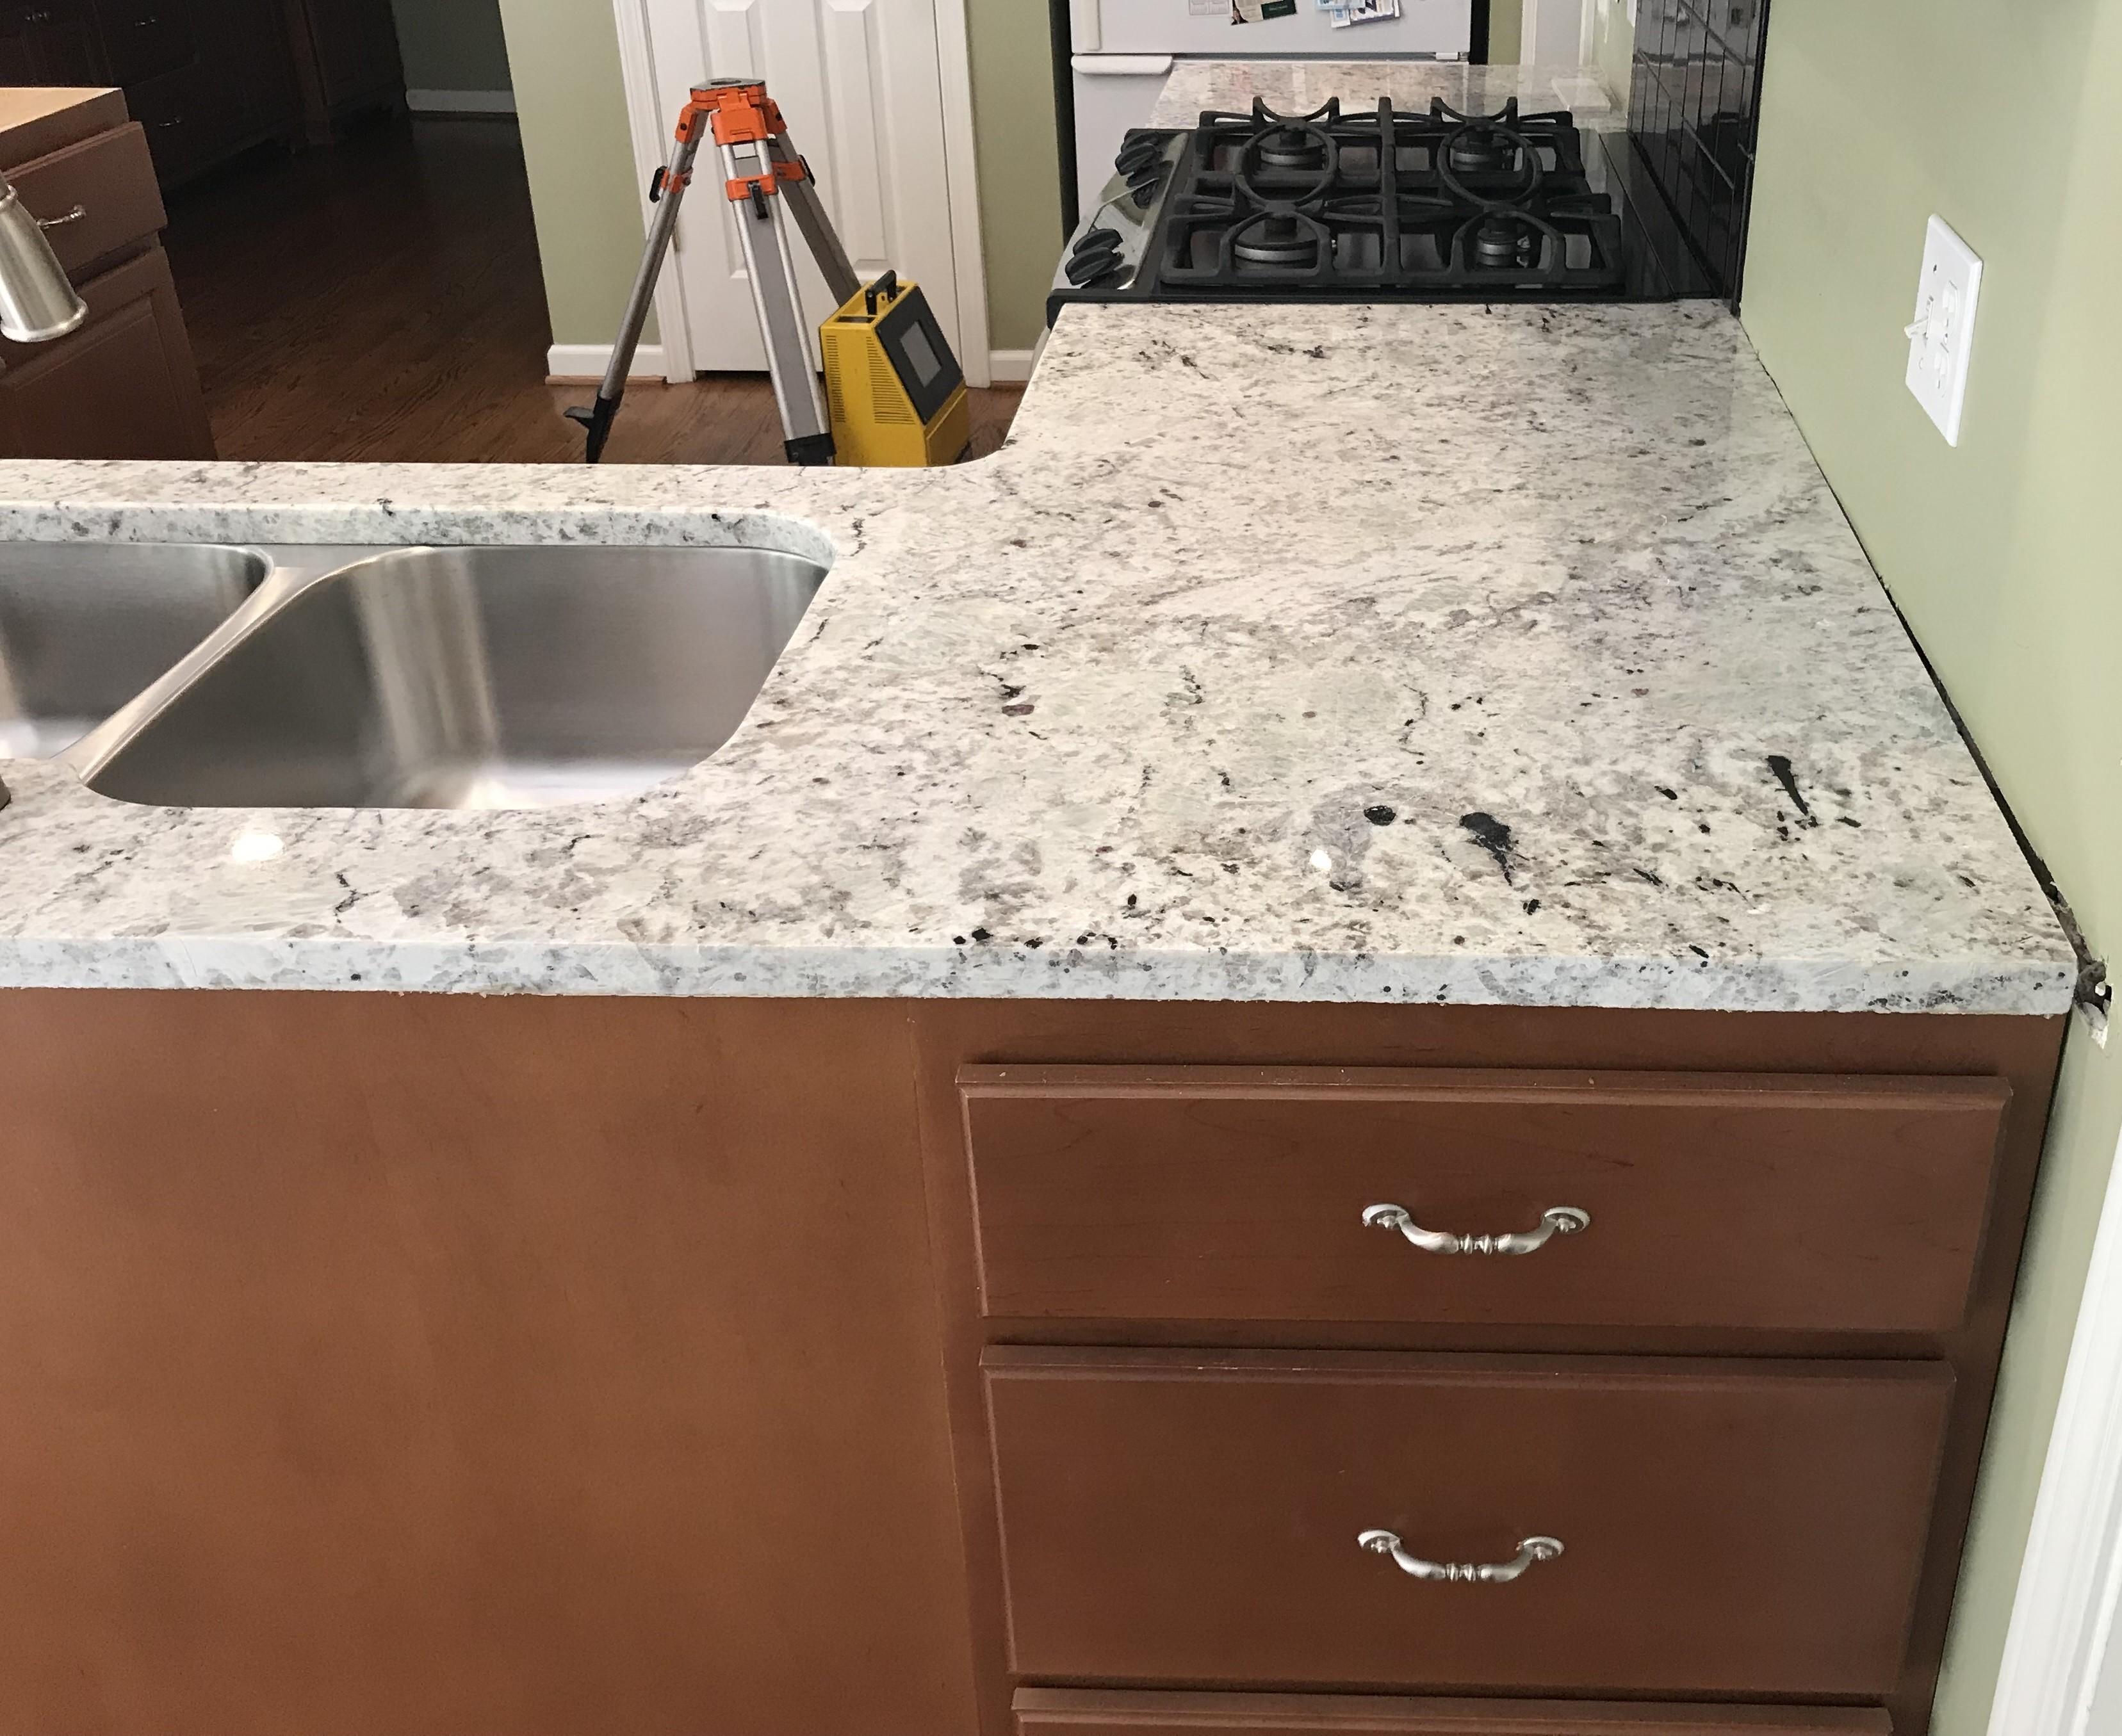 Shadow Storm kitchen countertop